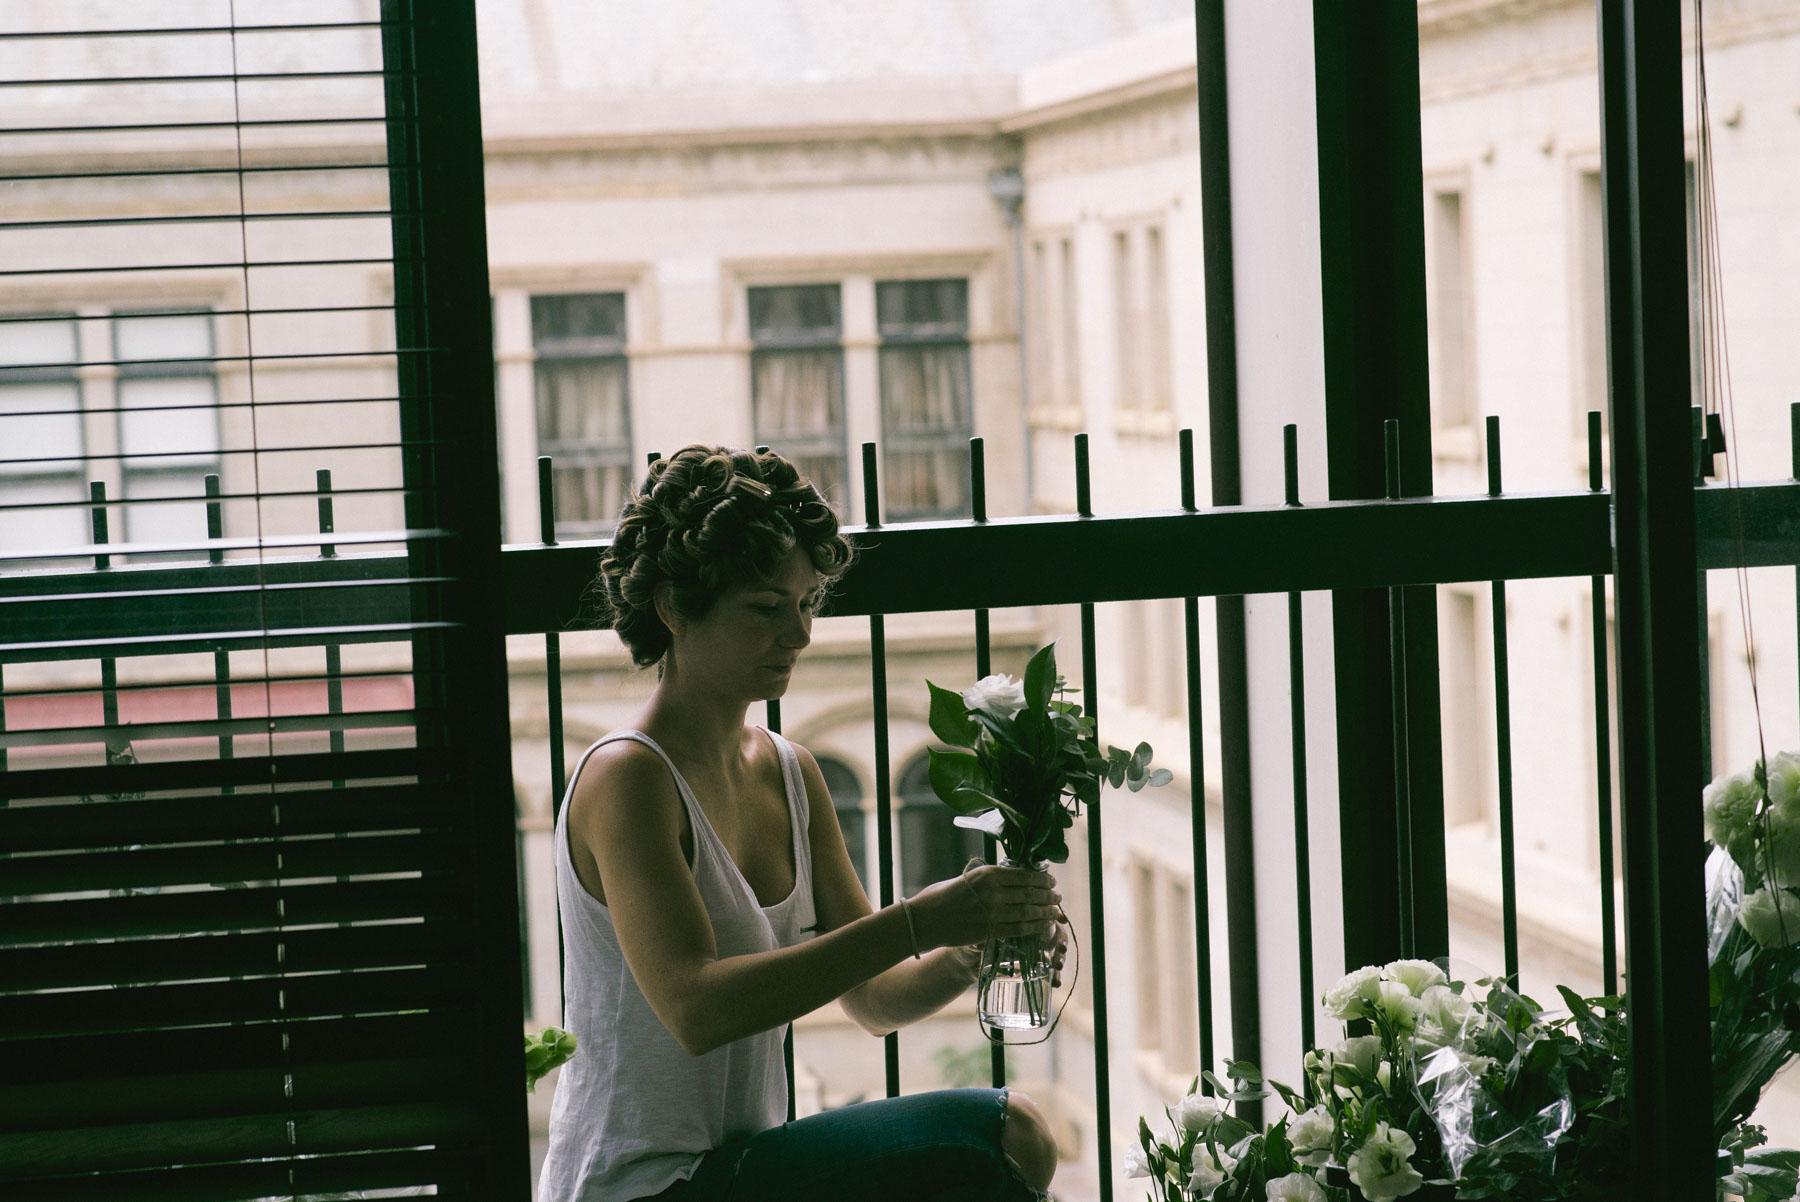 1501vand-021alan_moyle_wedding_portrait_brighton_bayside_werribee_estate_mansion_zoo_rustic_styled_garden_mansion_candid_documentry_victoria_whitelaw.jpg